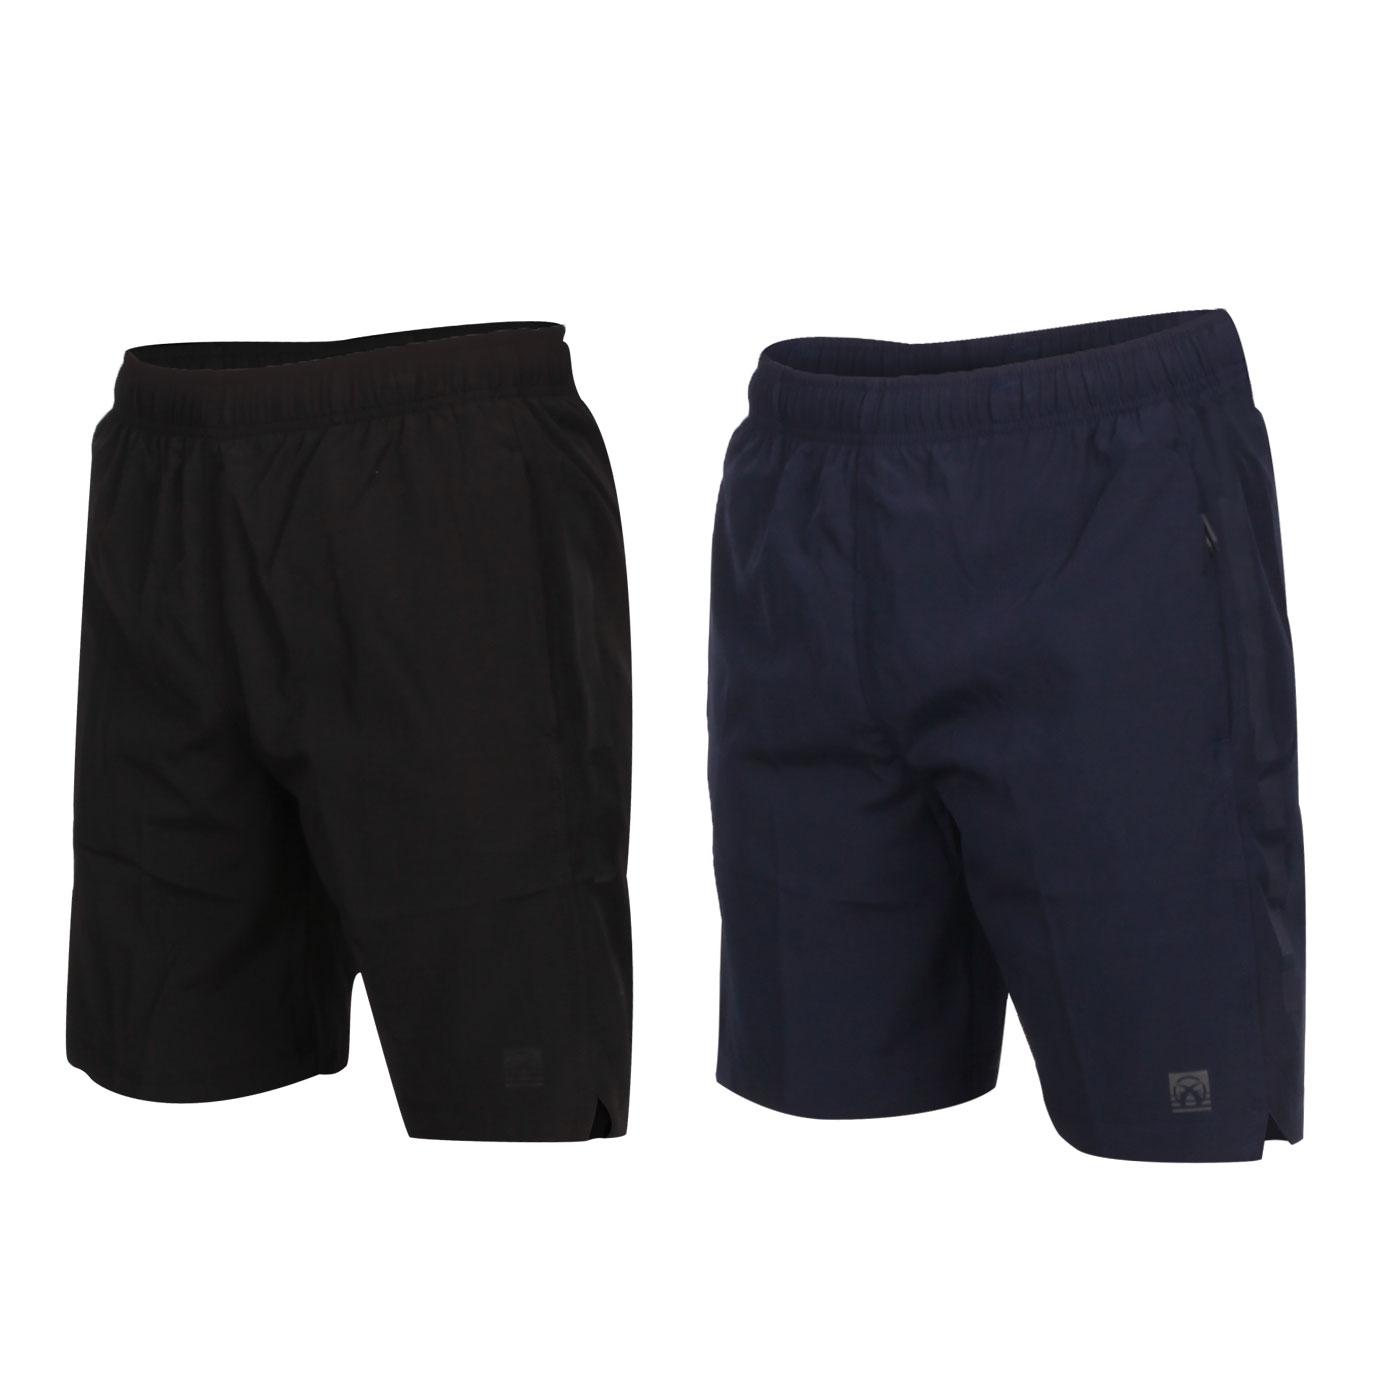 FIRESTAR 男款彈性平織短褲 C0515-10